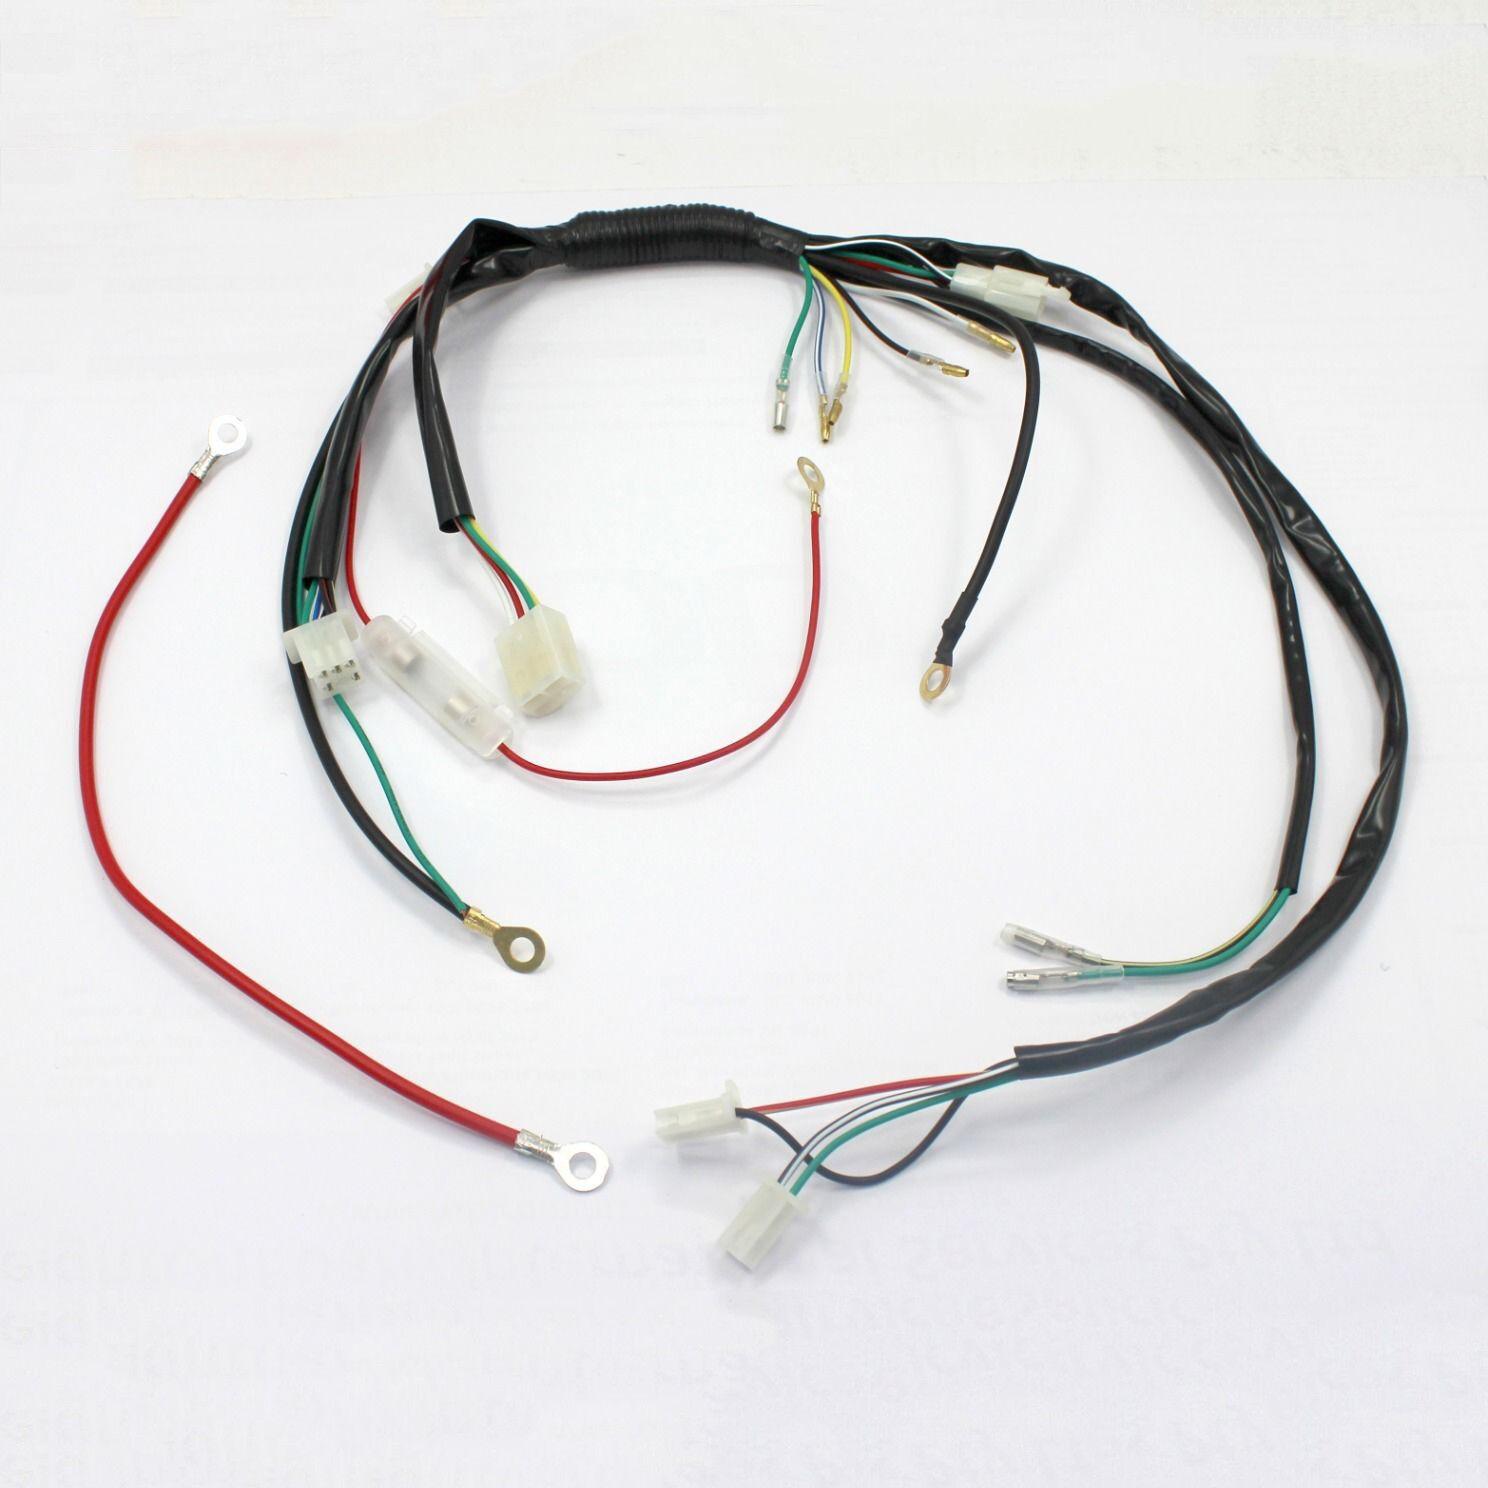 Wire Wiring Harness Loom 90cc 110cc 125cc 140cc 150cc Pit